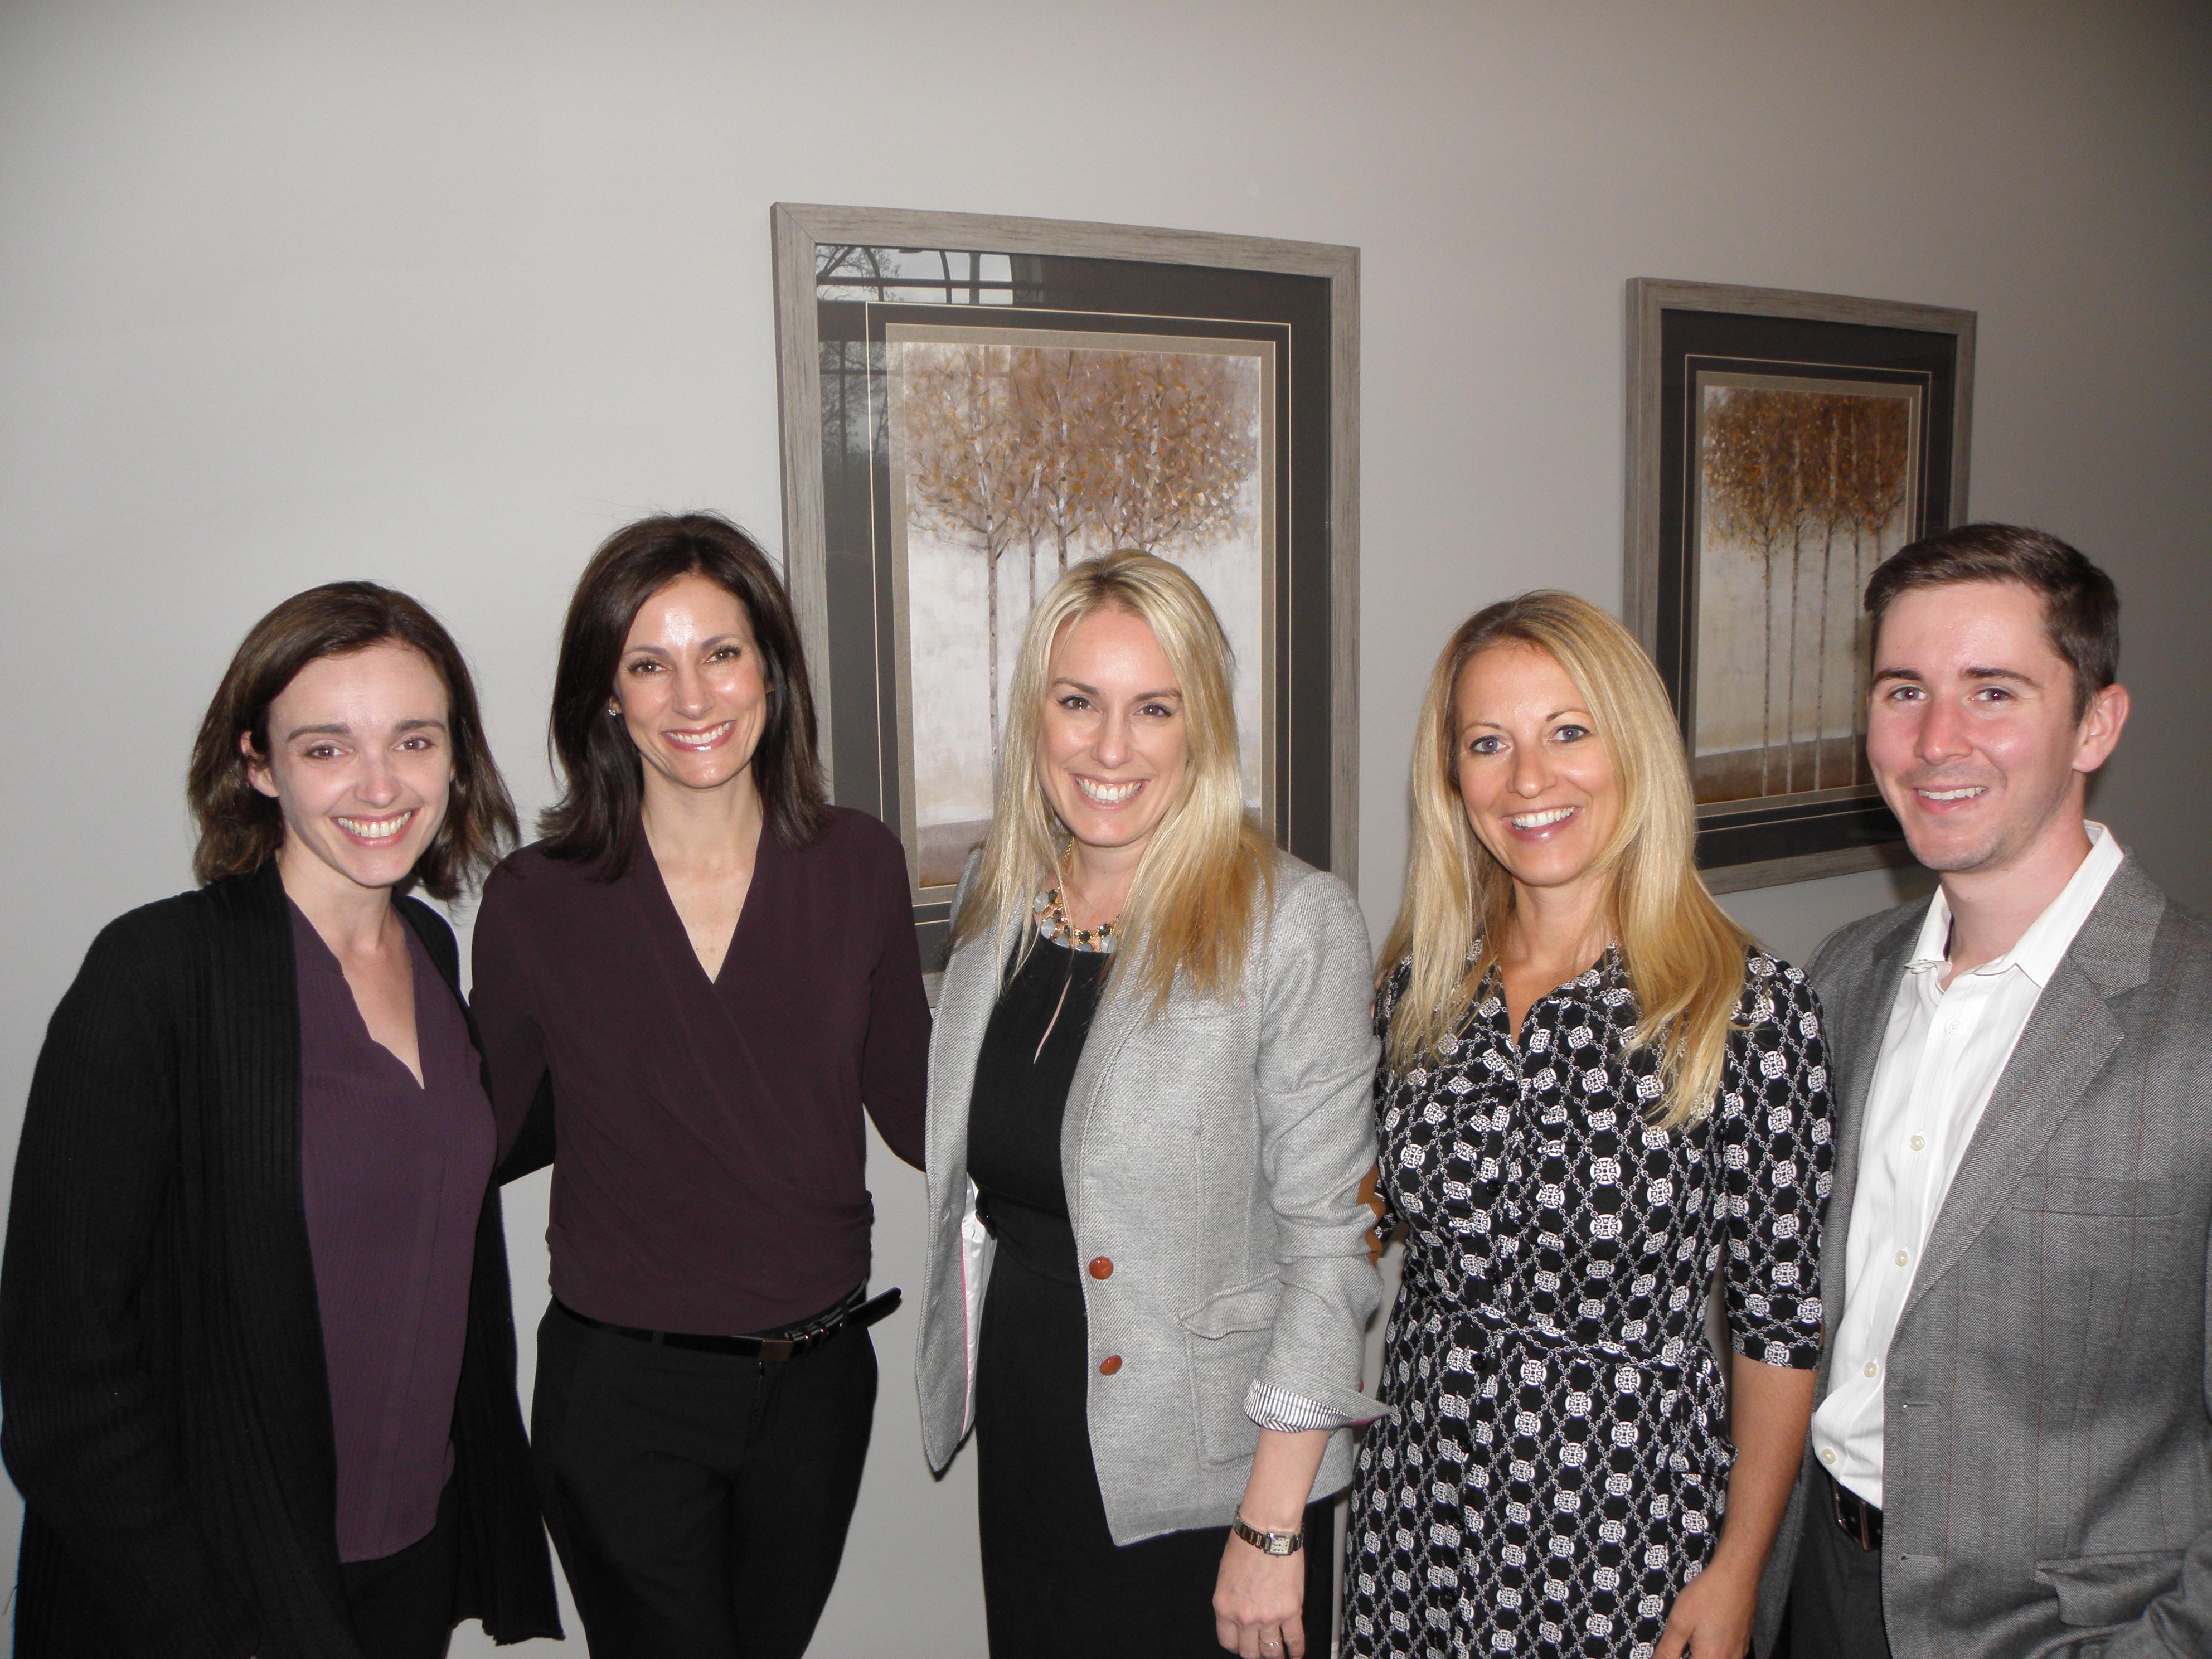 Jen-Ruffner-Anne-Hodge-Heather-Gustafson-Erika-Guest-Jordan-Euson.jpg